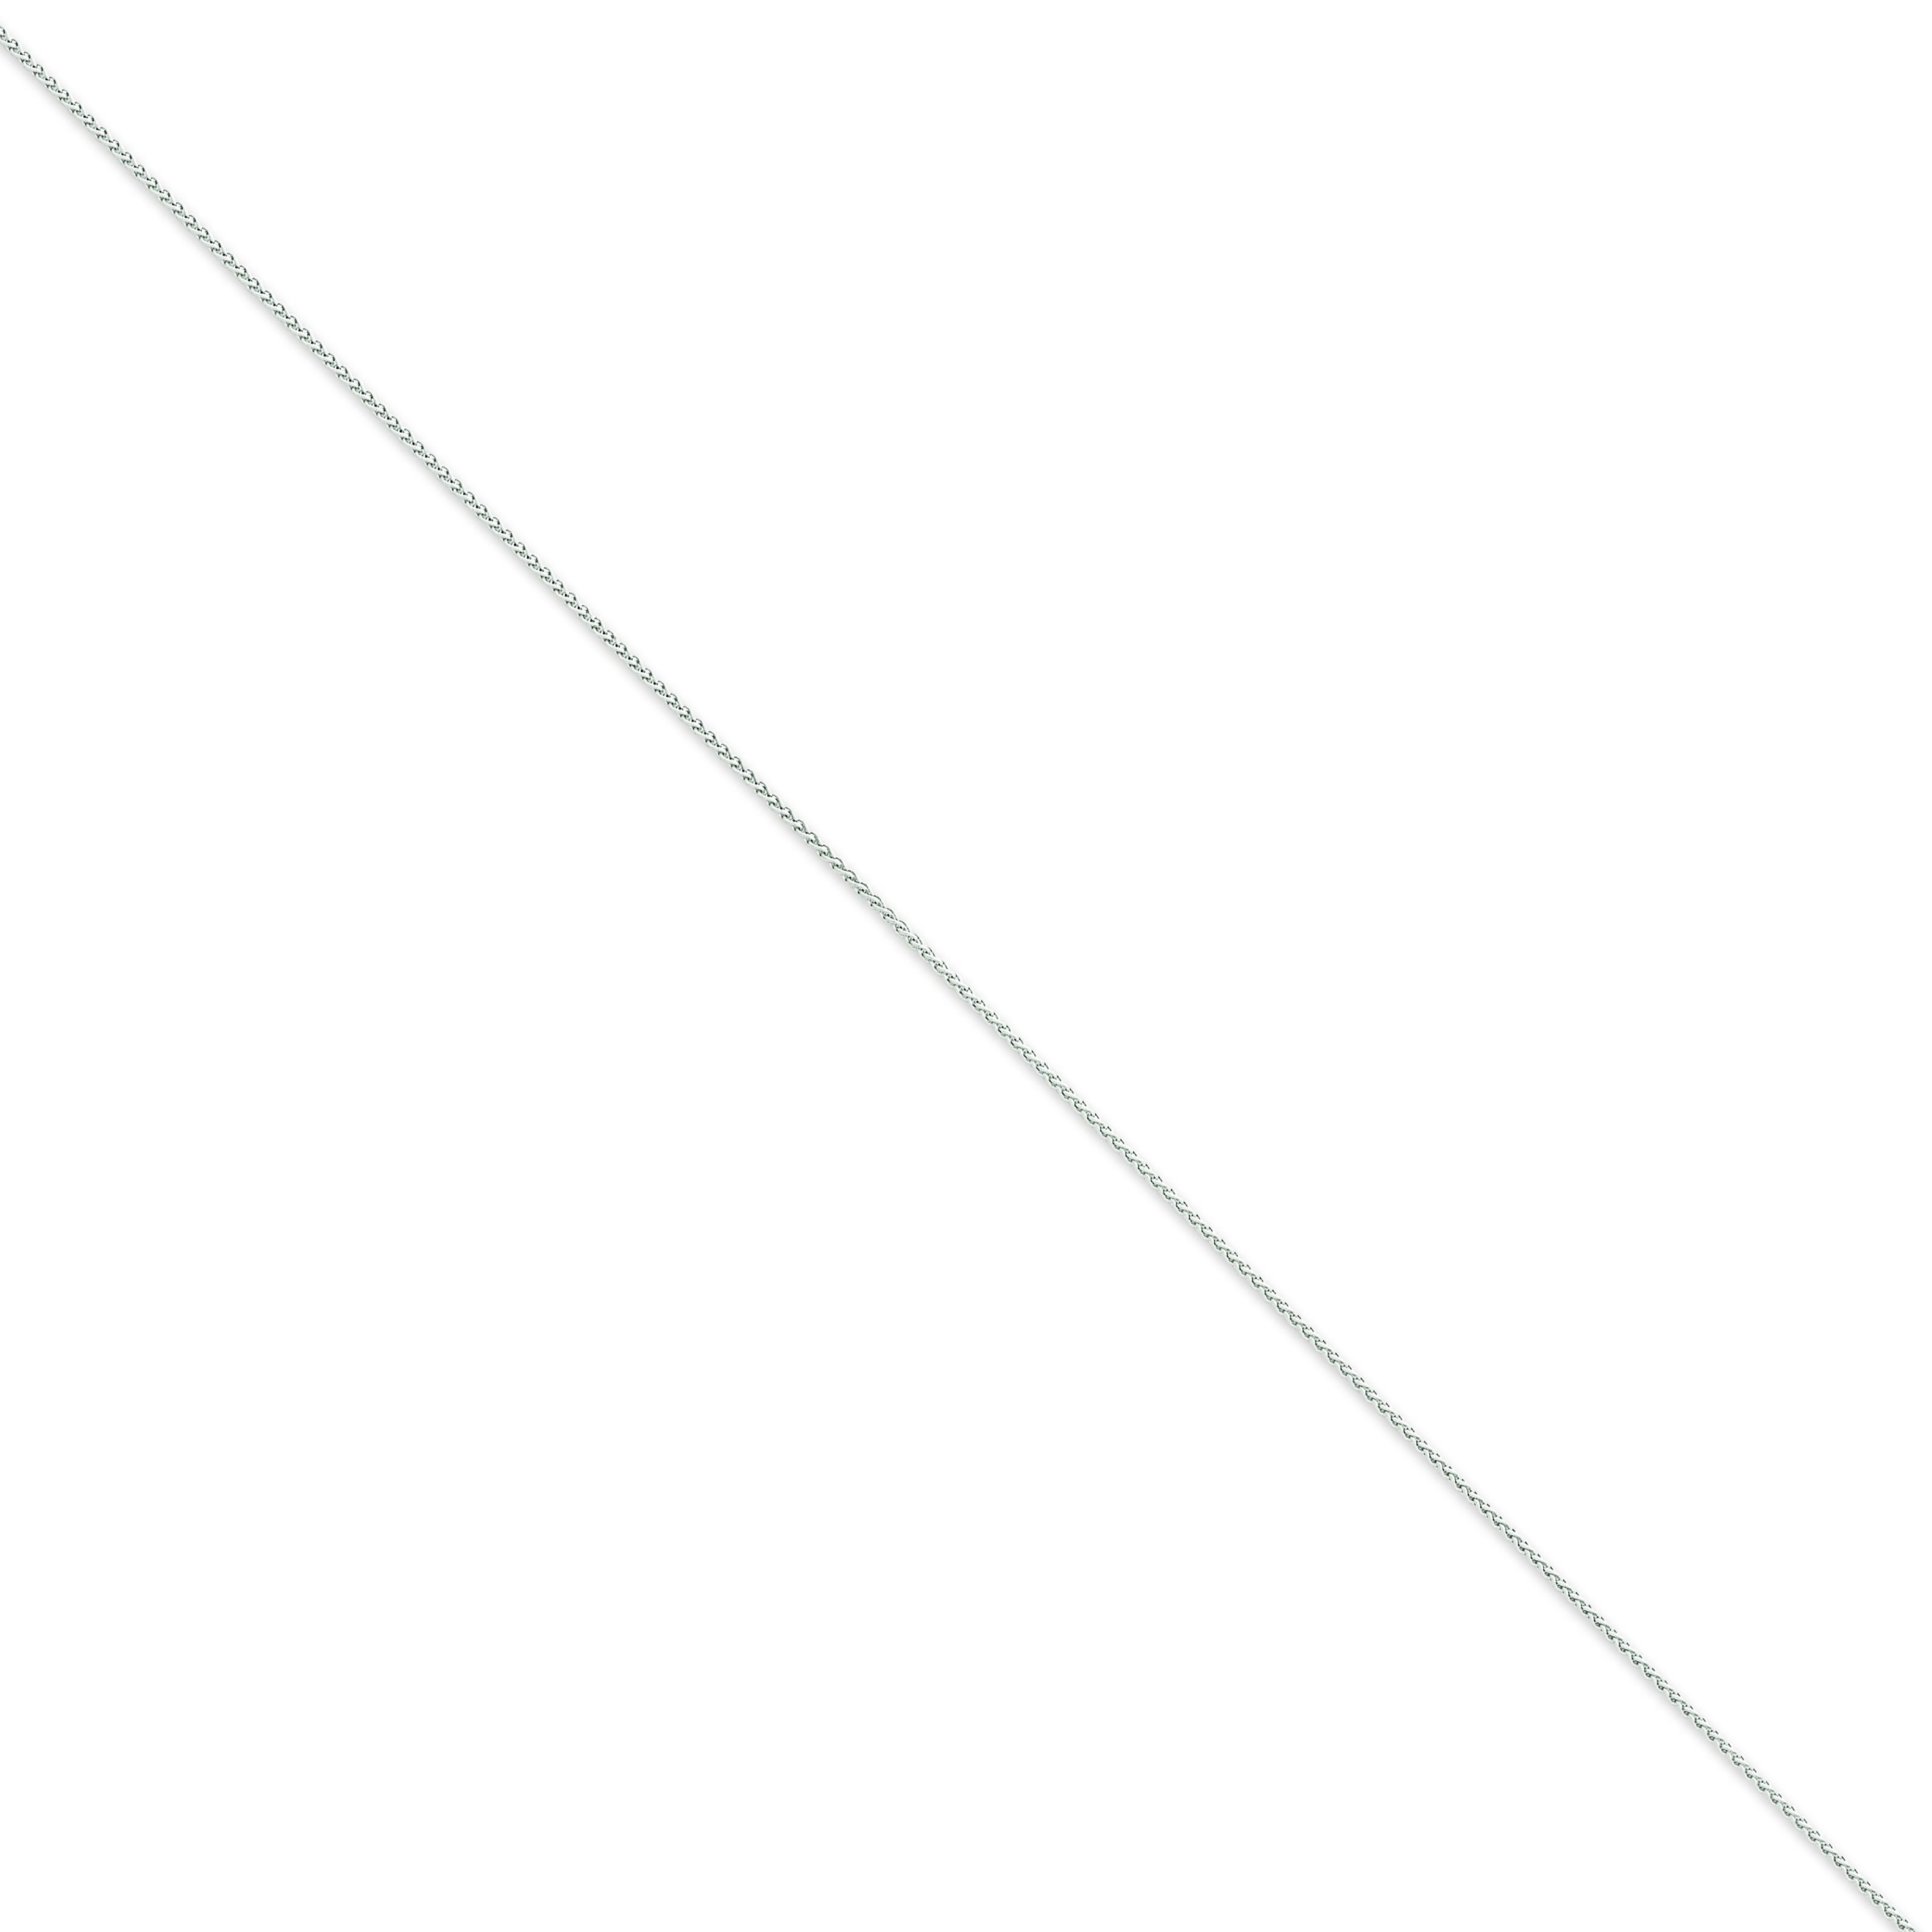 14k Yellow Gold 16 inch 1.00 mm  Spiga Choker Necklace